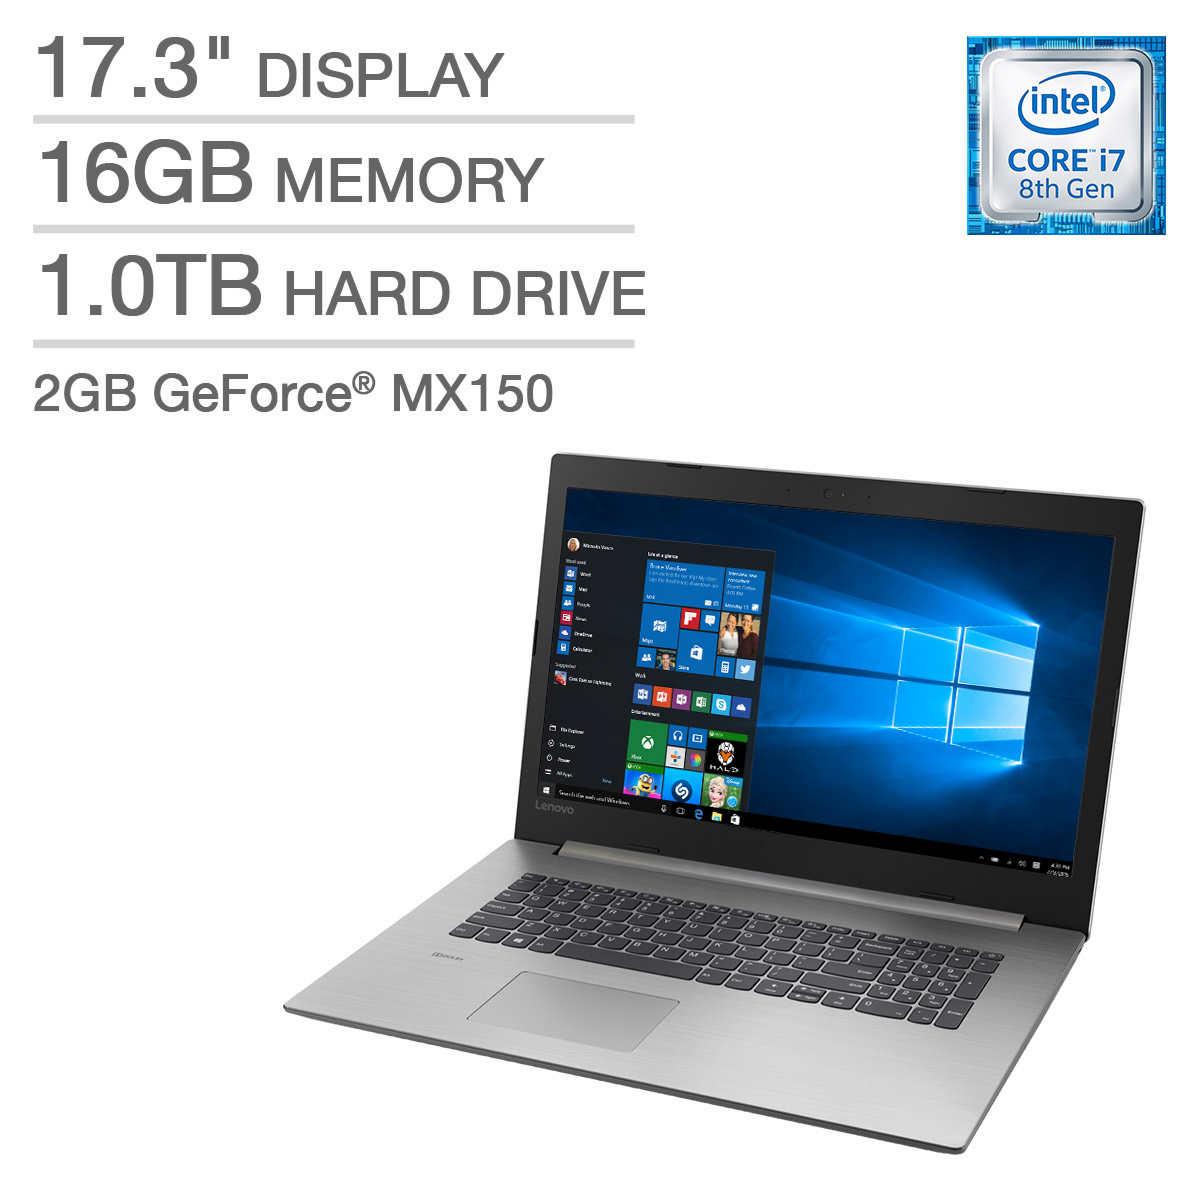 Lenovo Ideapad 330 17 Laptop - Intel Core i7 - GeForce MX150